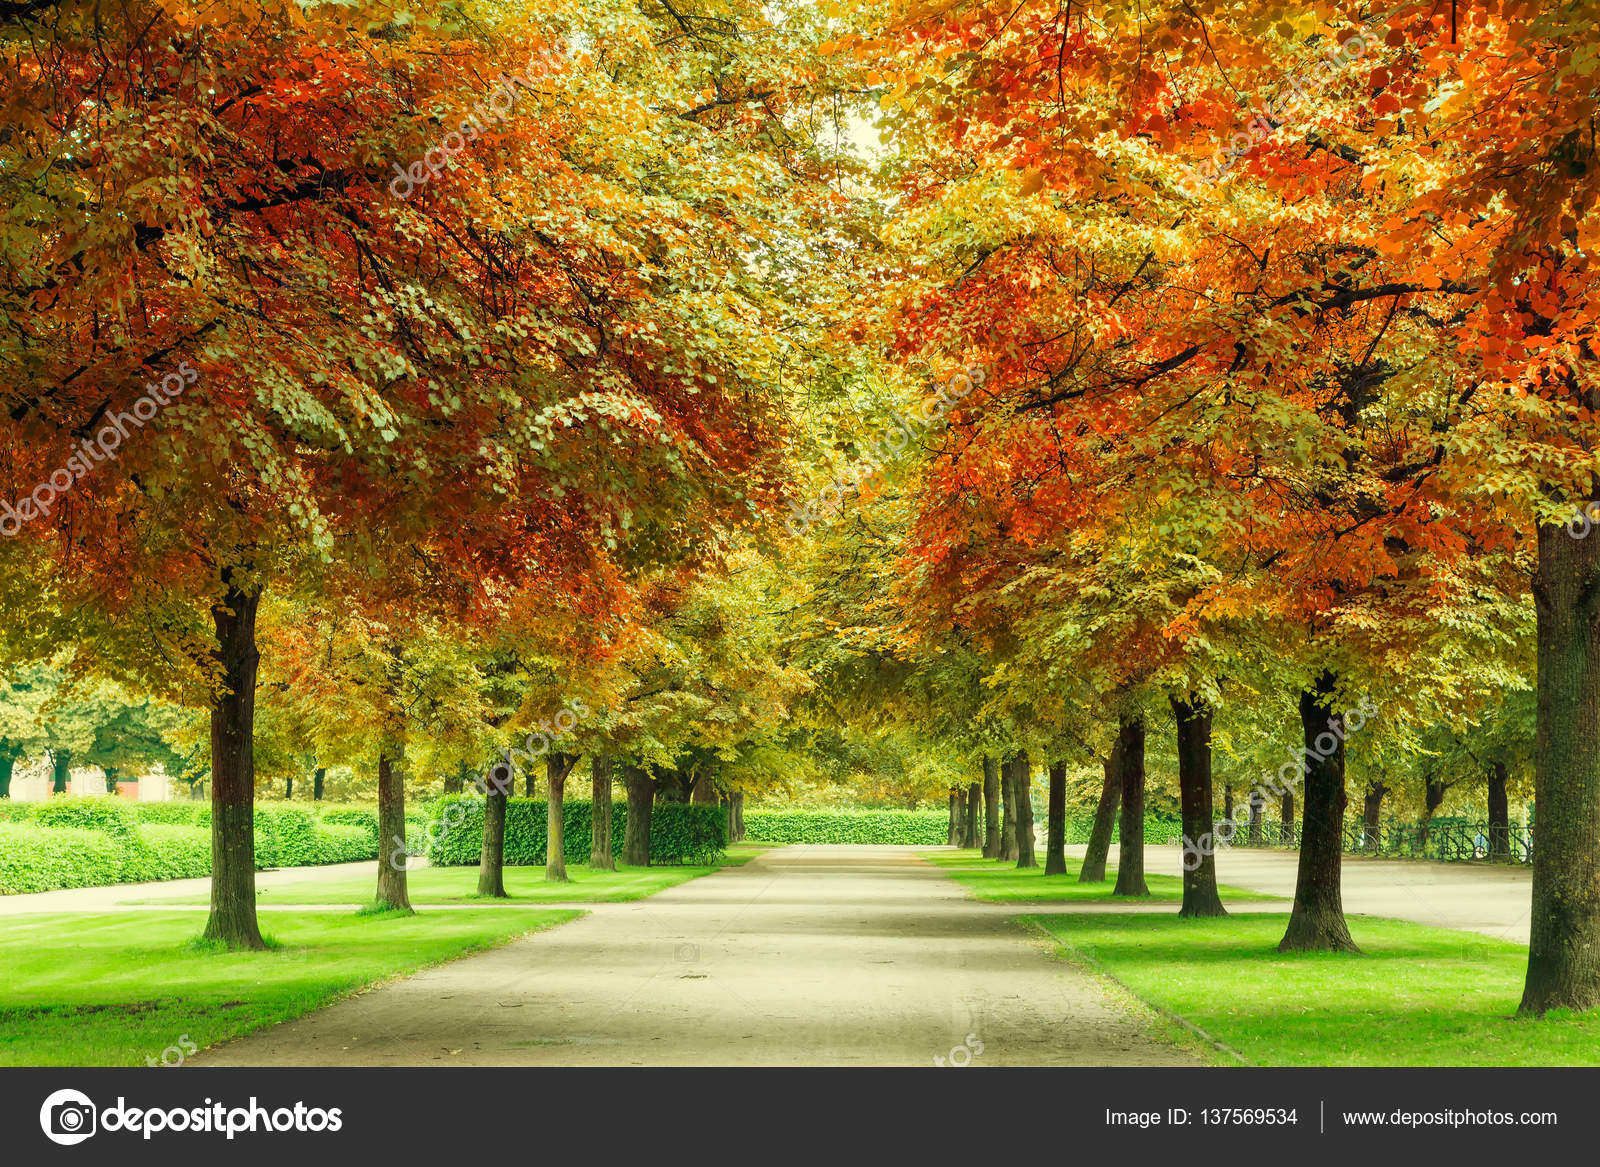 Sfondi di paesaggi bellissimi sfondi for Paesaggi bellissimi per desktop